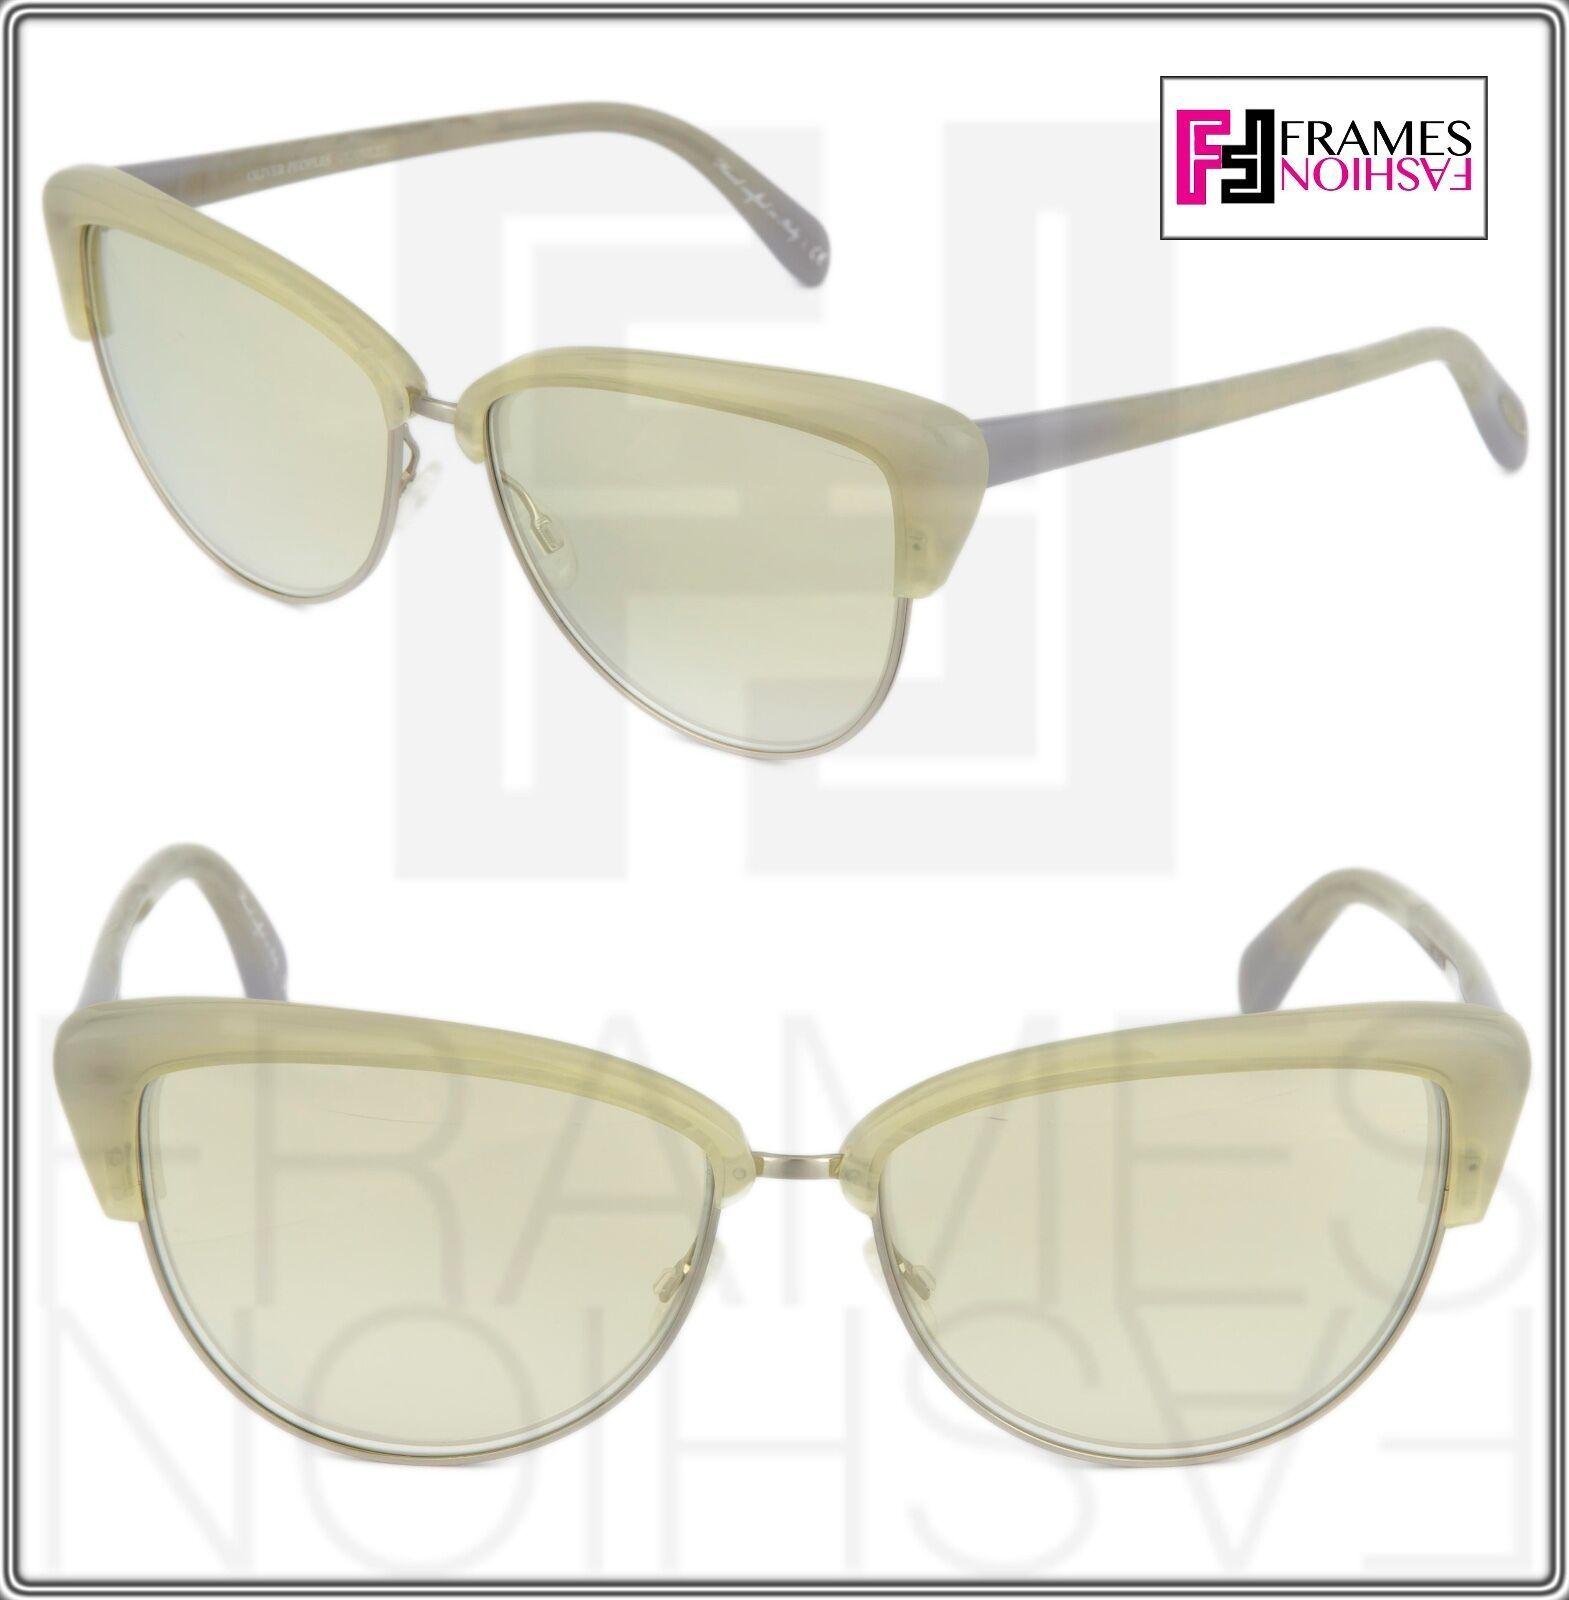 OLIVER PEOPLES ALISHA OV5244S White Pearl Flash Mirrored Sunglasses 5244 Women